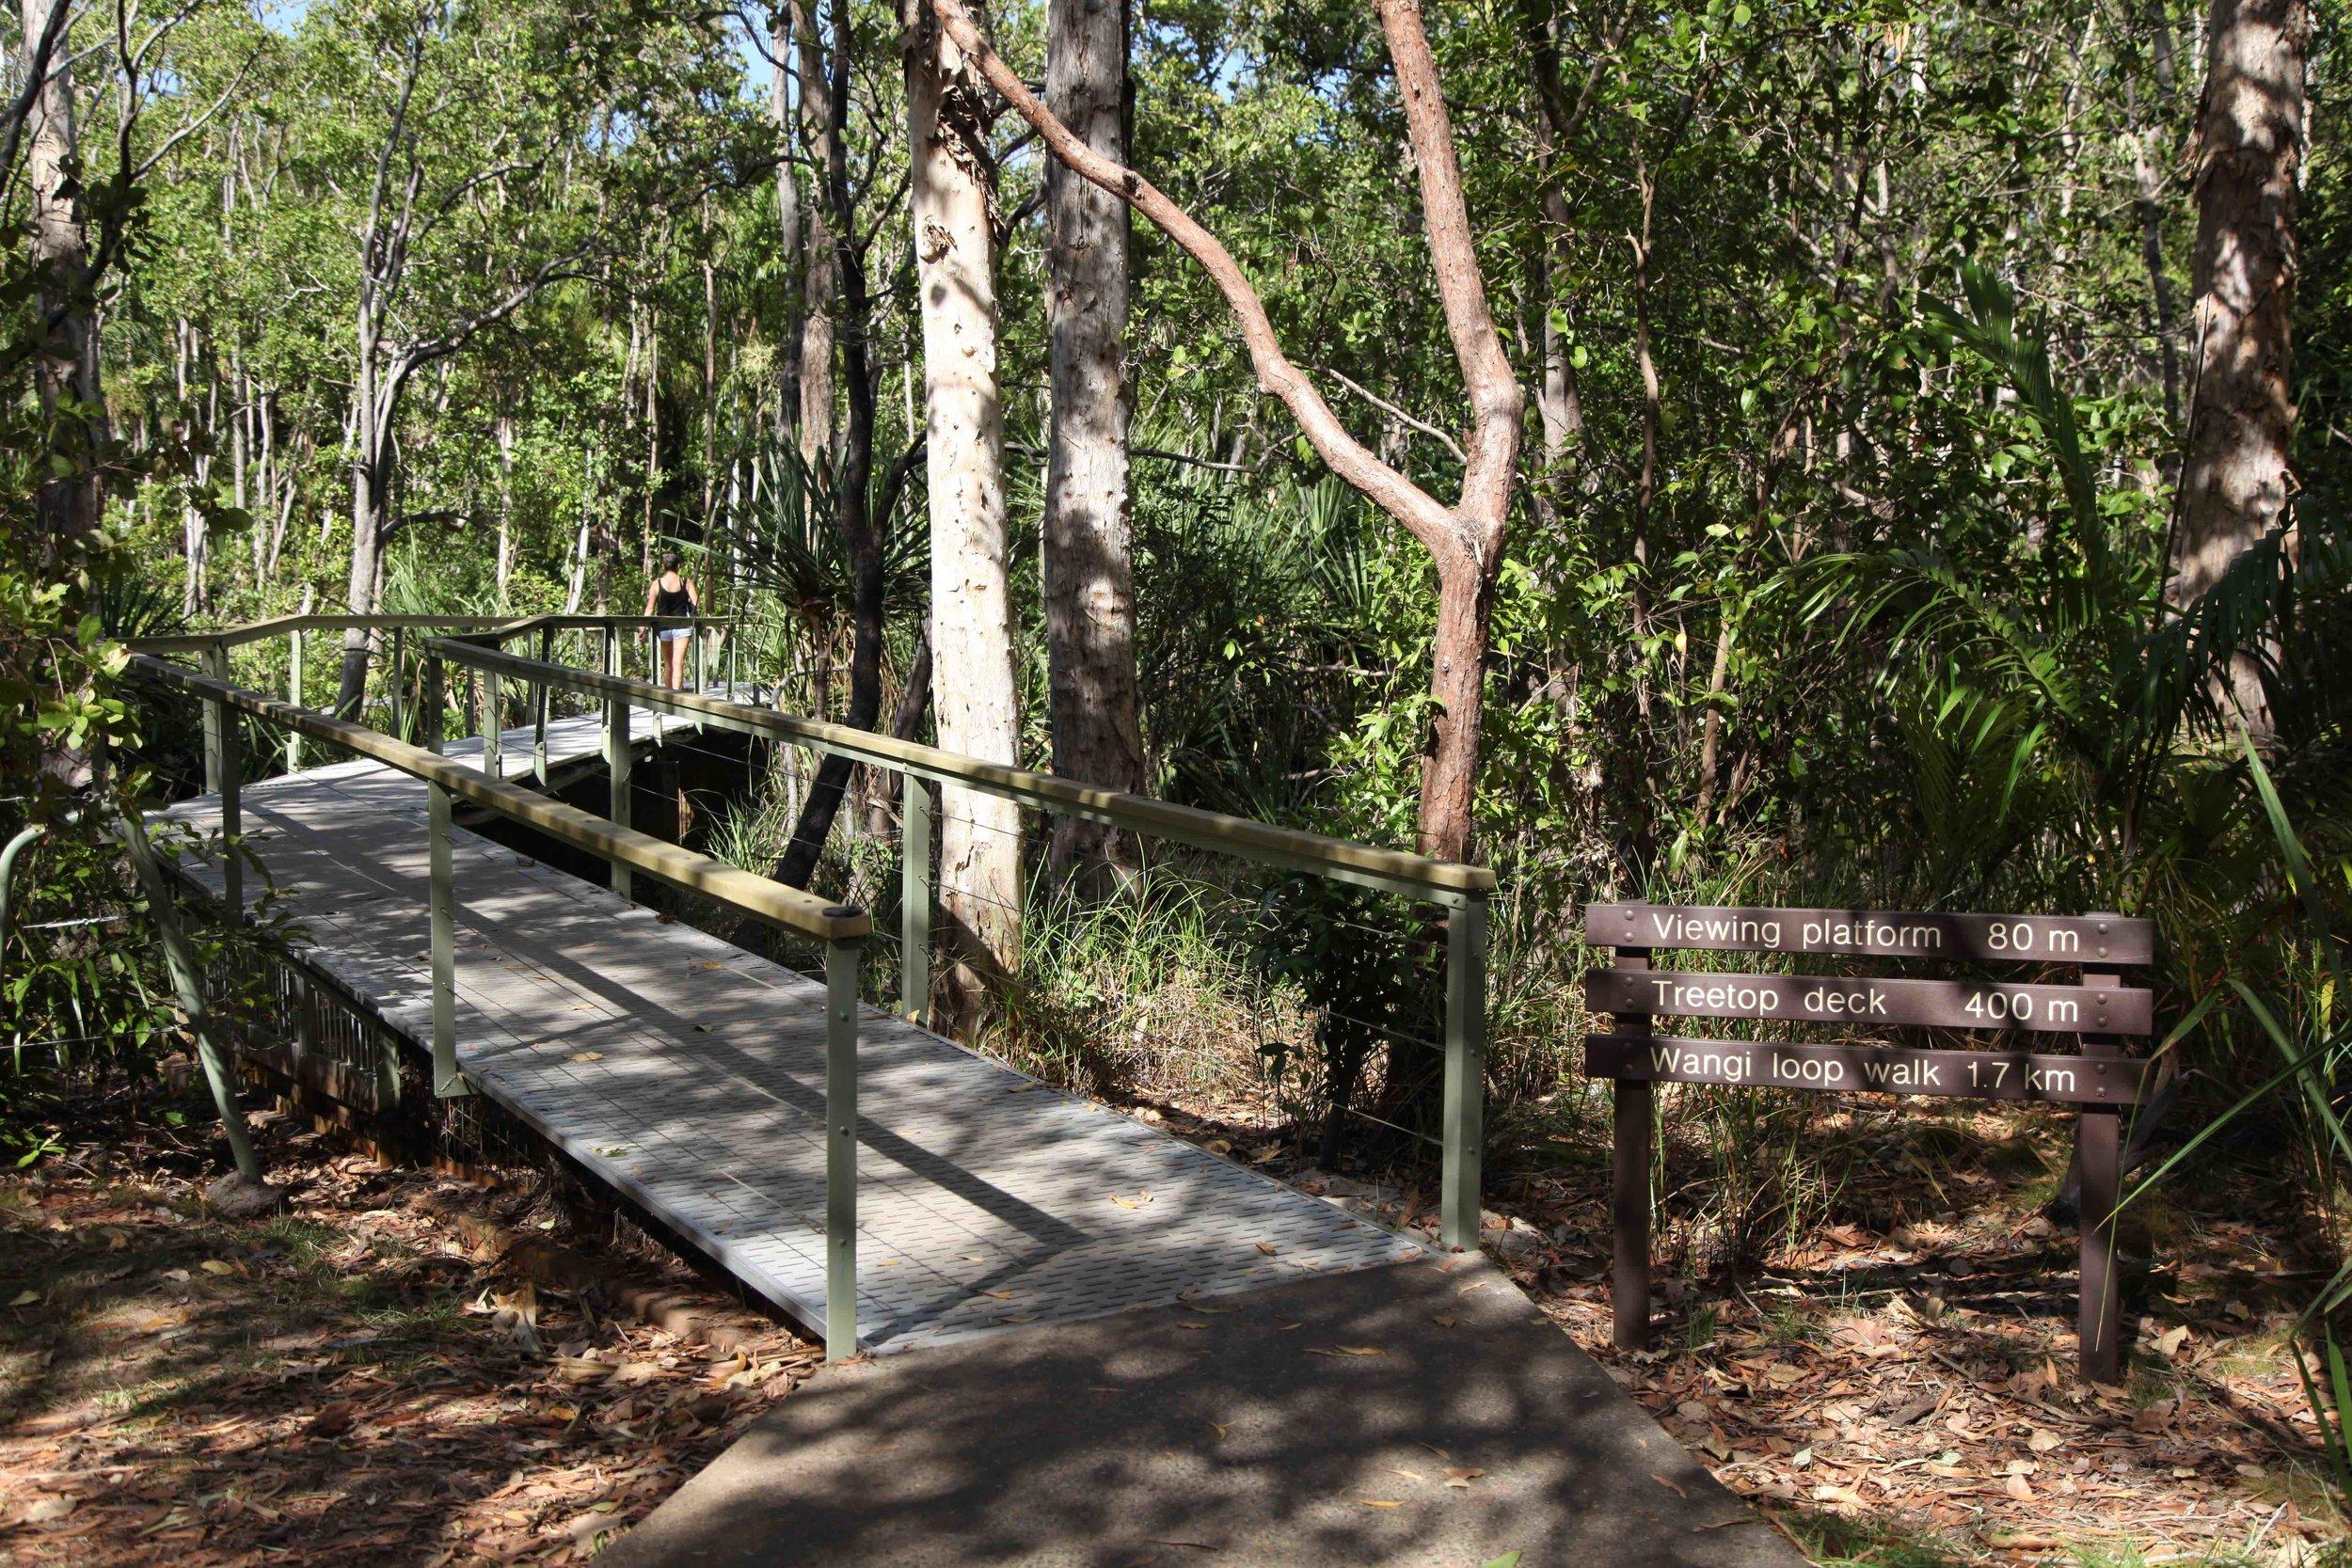 Wangi loop walk is a 1.7km walk in Litchfield National Park.